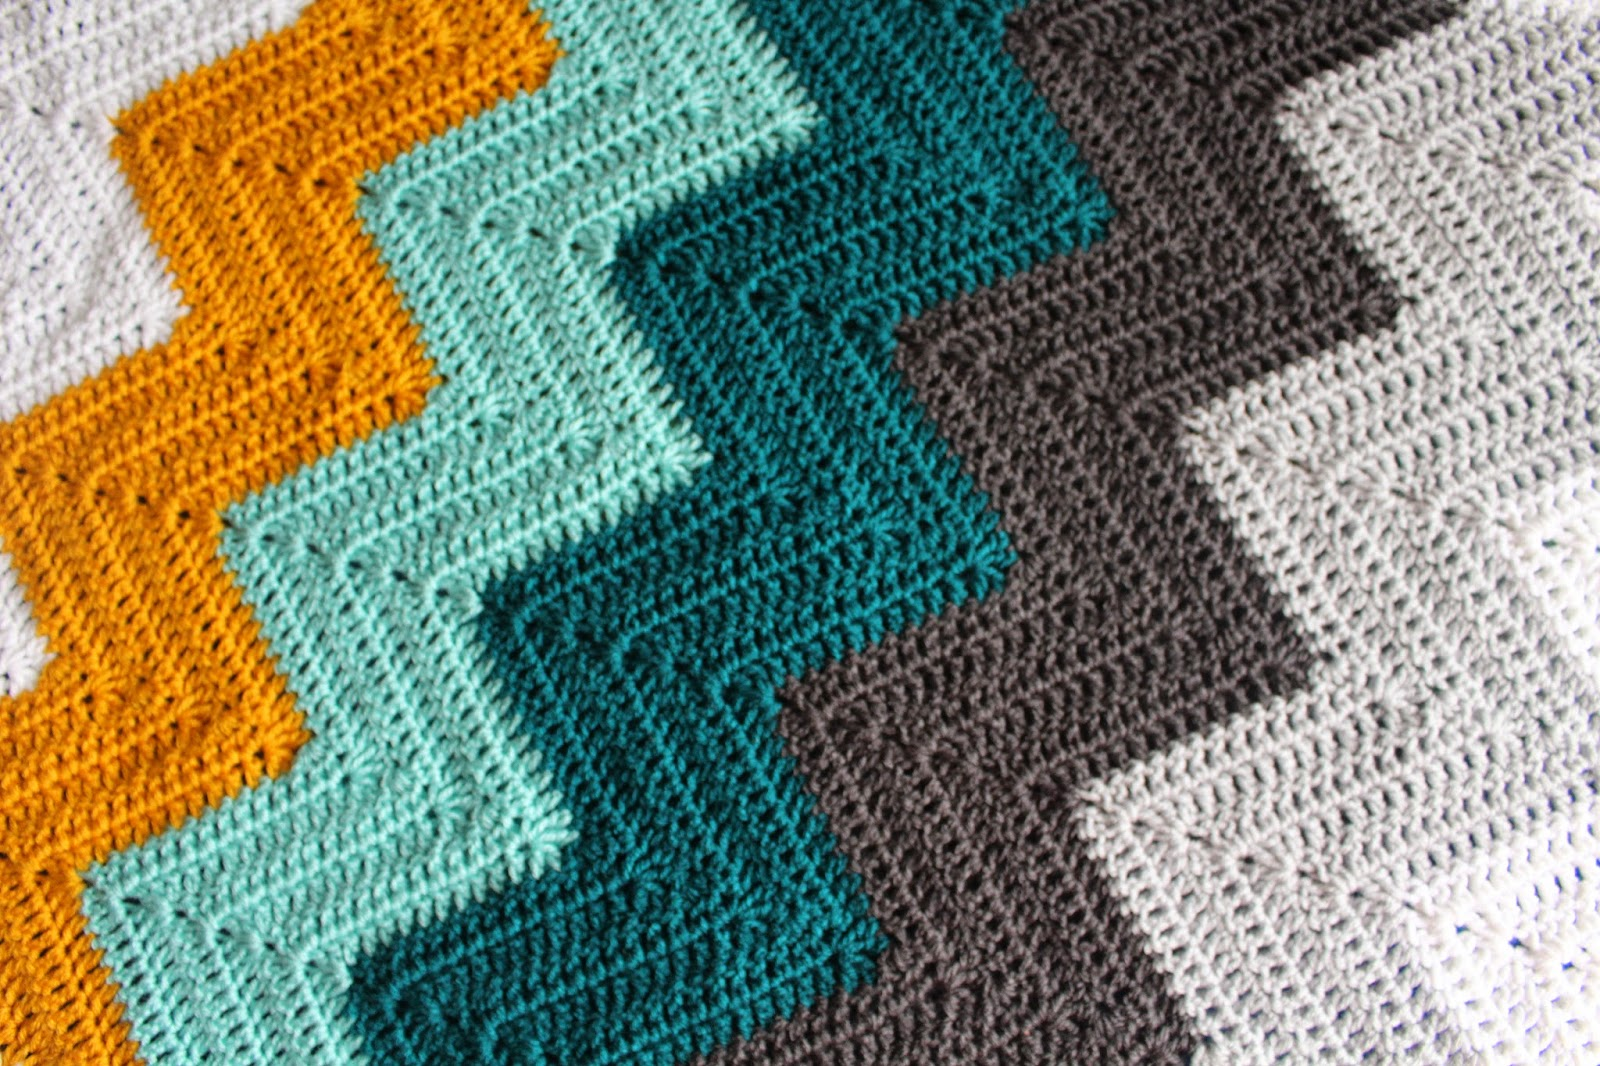 Lively Crochet - Rhythmic Youth: Teal Dreams - Chevron Baby Blanket